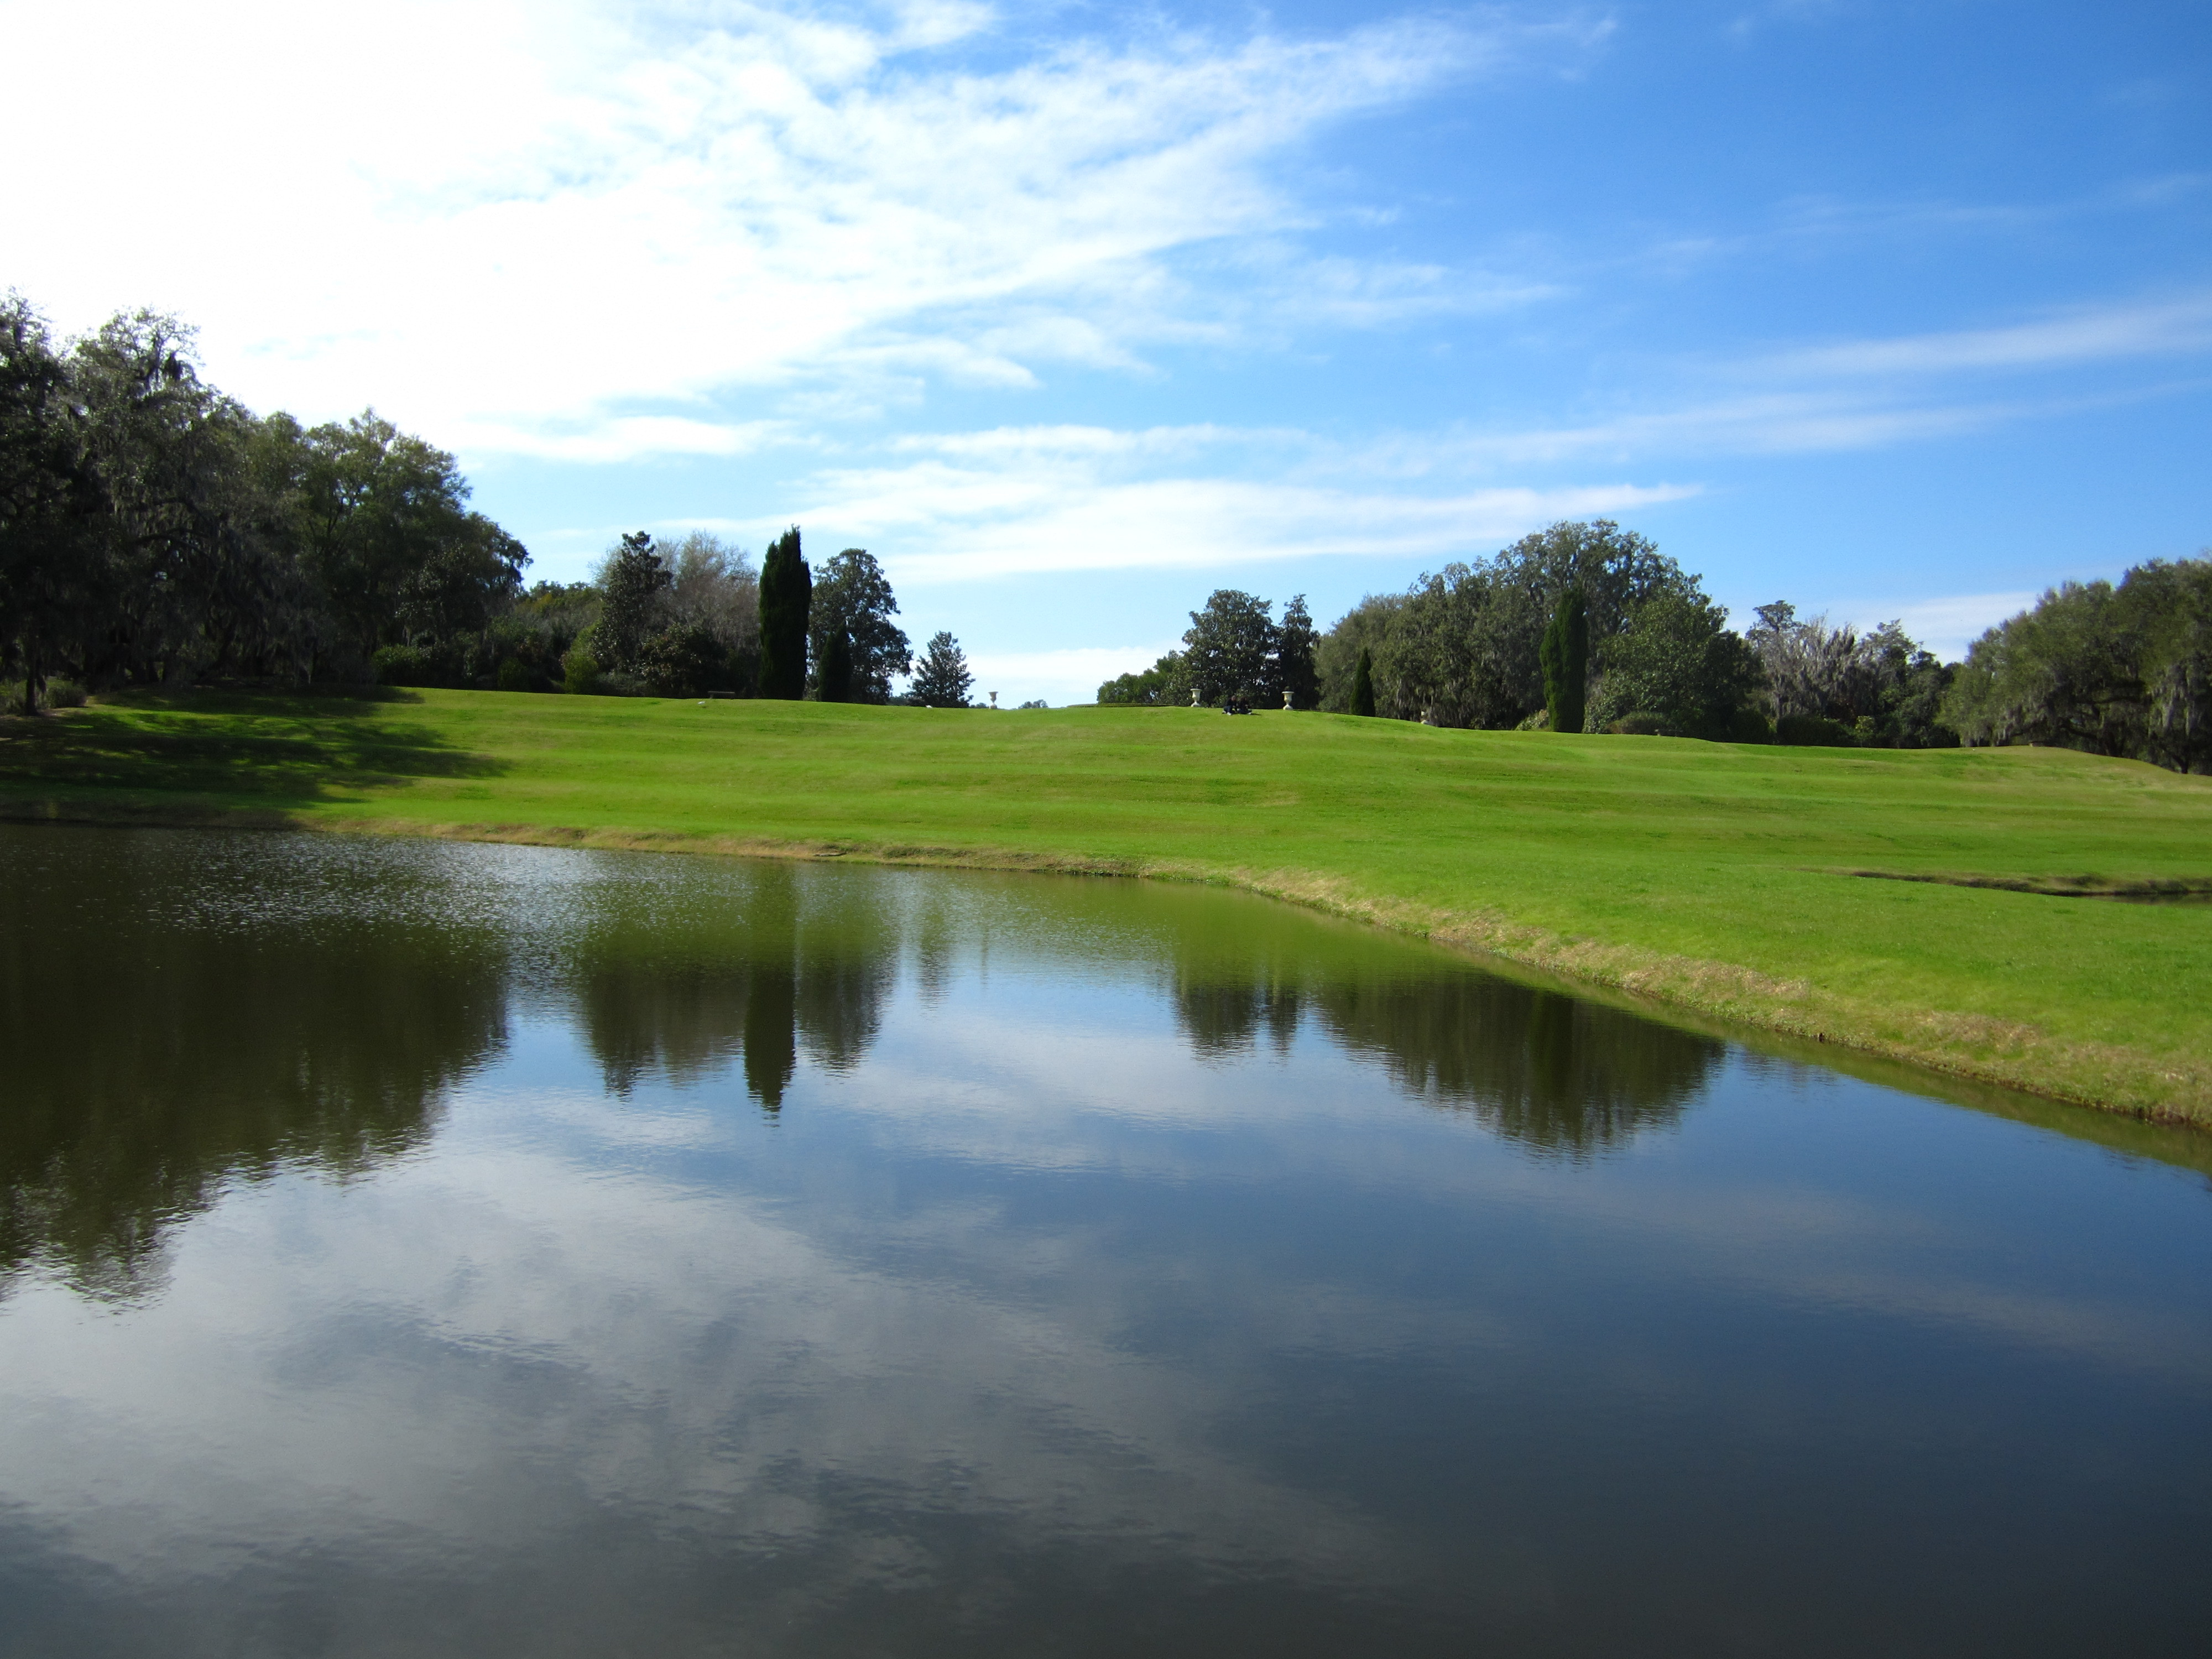 Best ideas about South Carolina Landscape . Save or Pin Middleton Place Charleston South Carolina Part II Now.